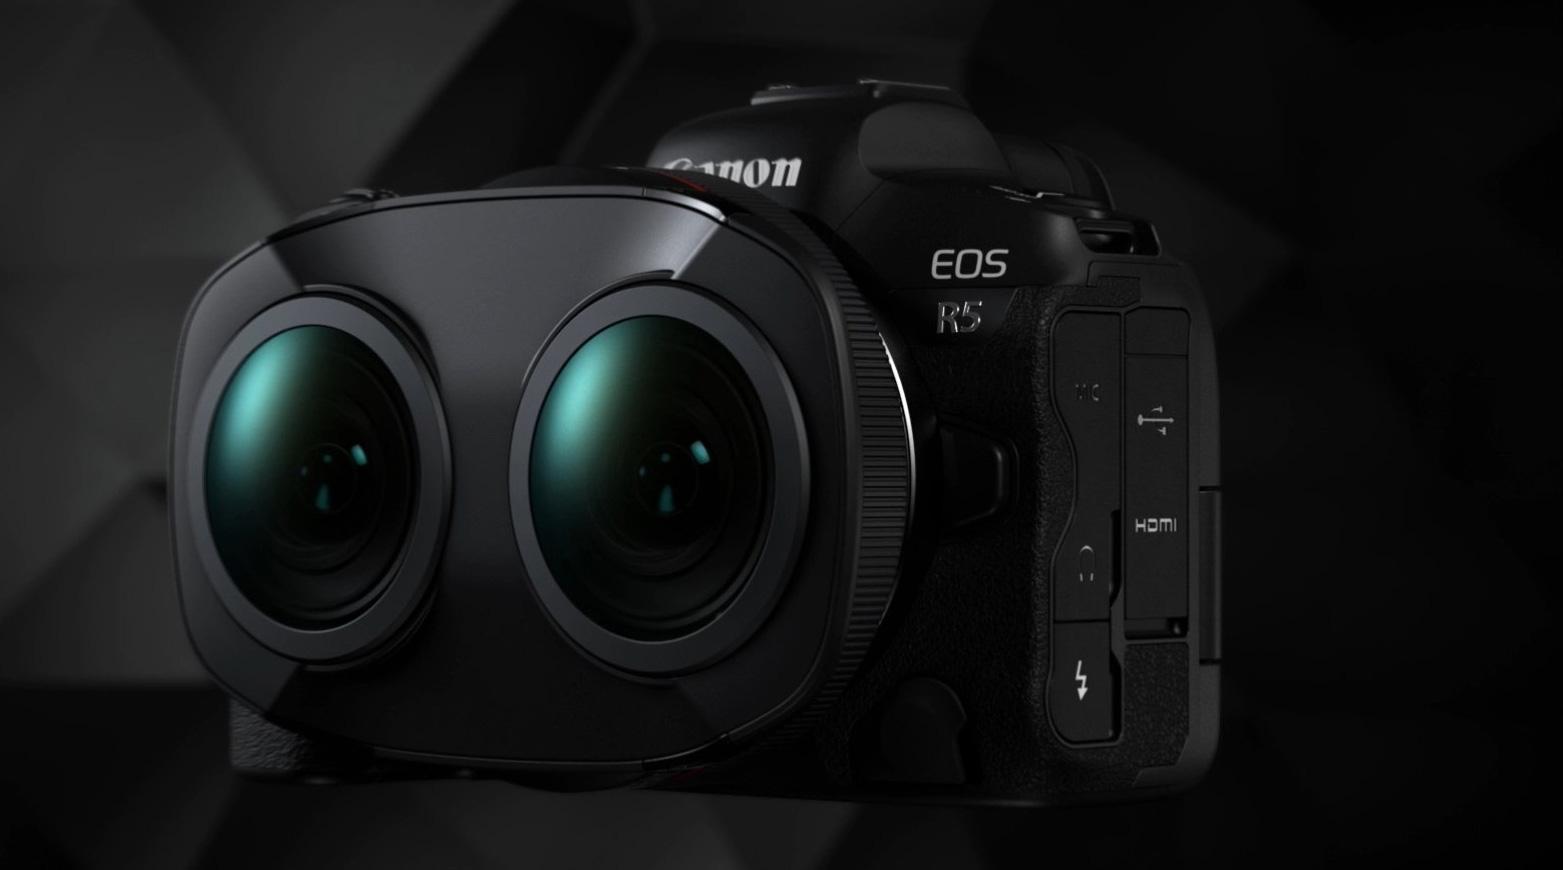 Canon brings 5.2mm F2.8 L DUAL FISHEYE optics for VR production